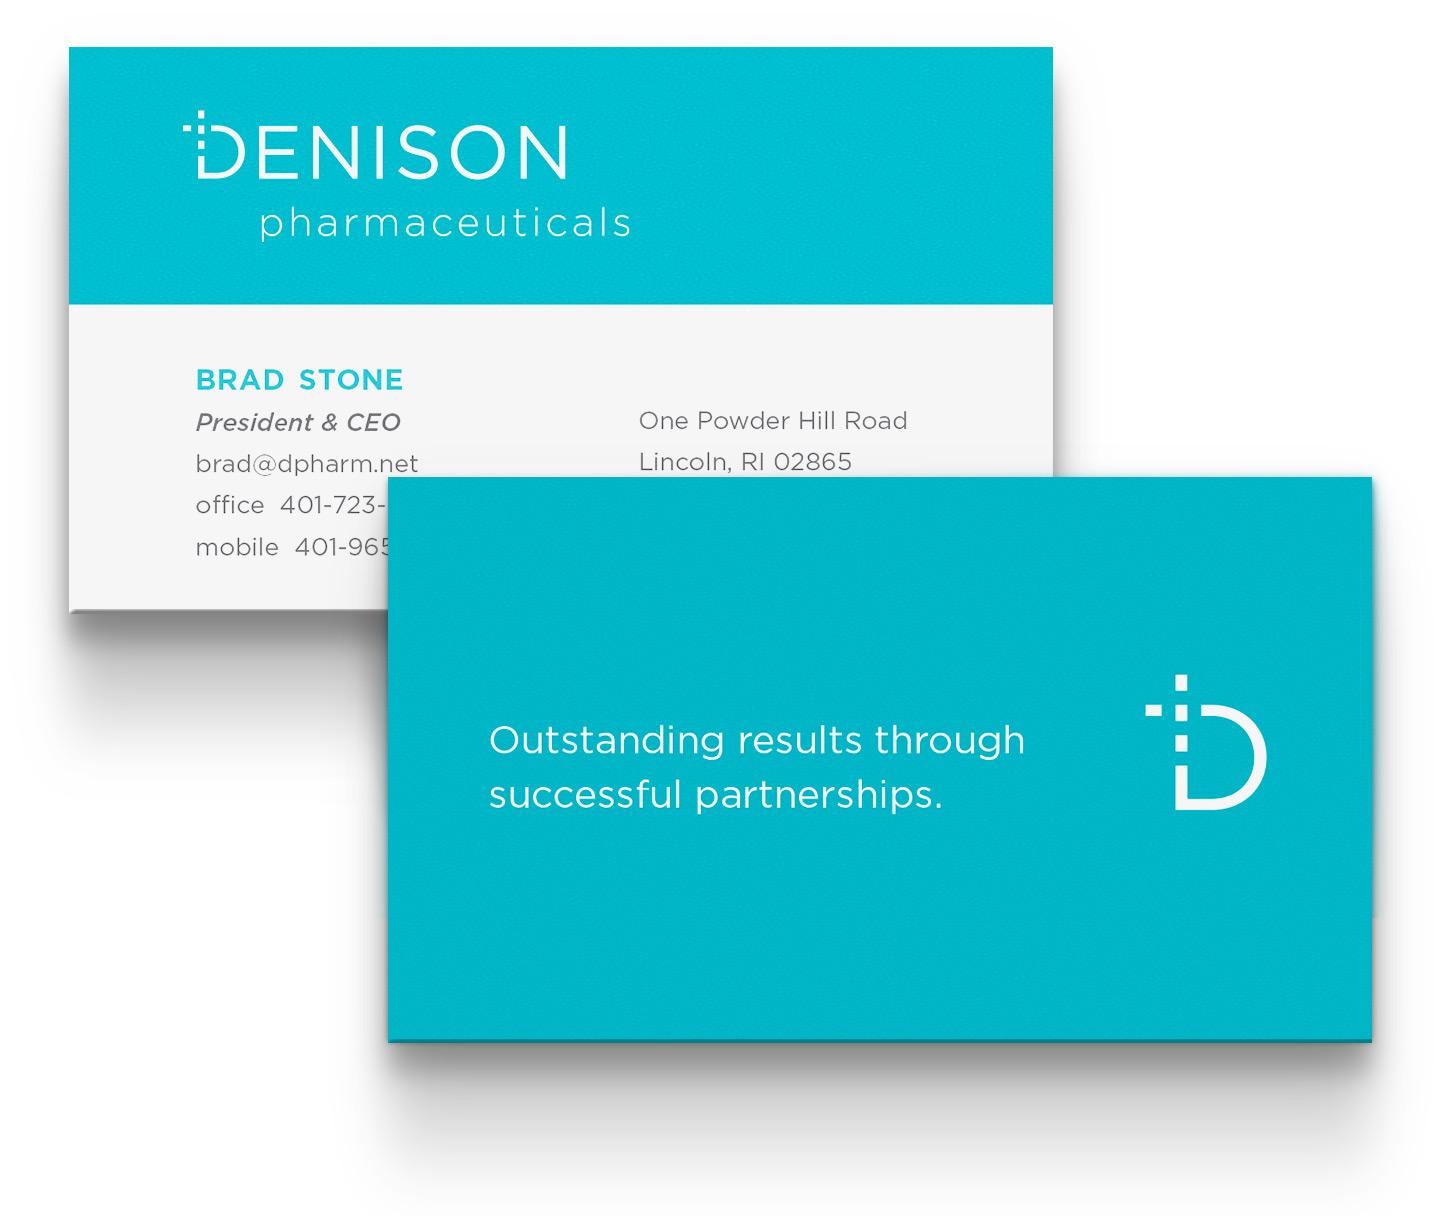 business card design: Denison Pharmaceuticals, Lincoln, RI